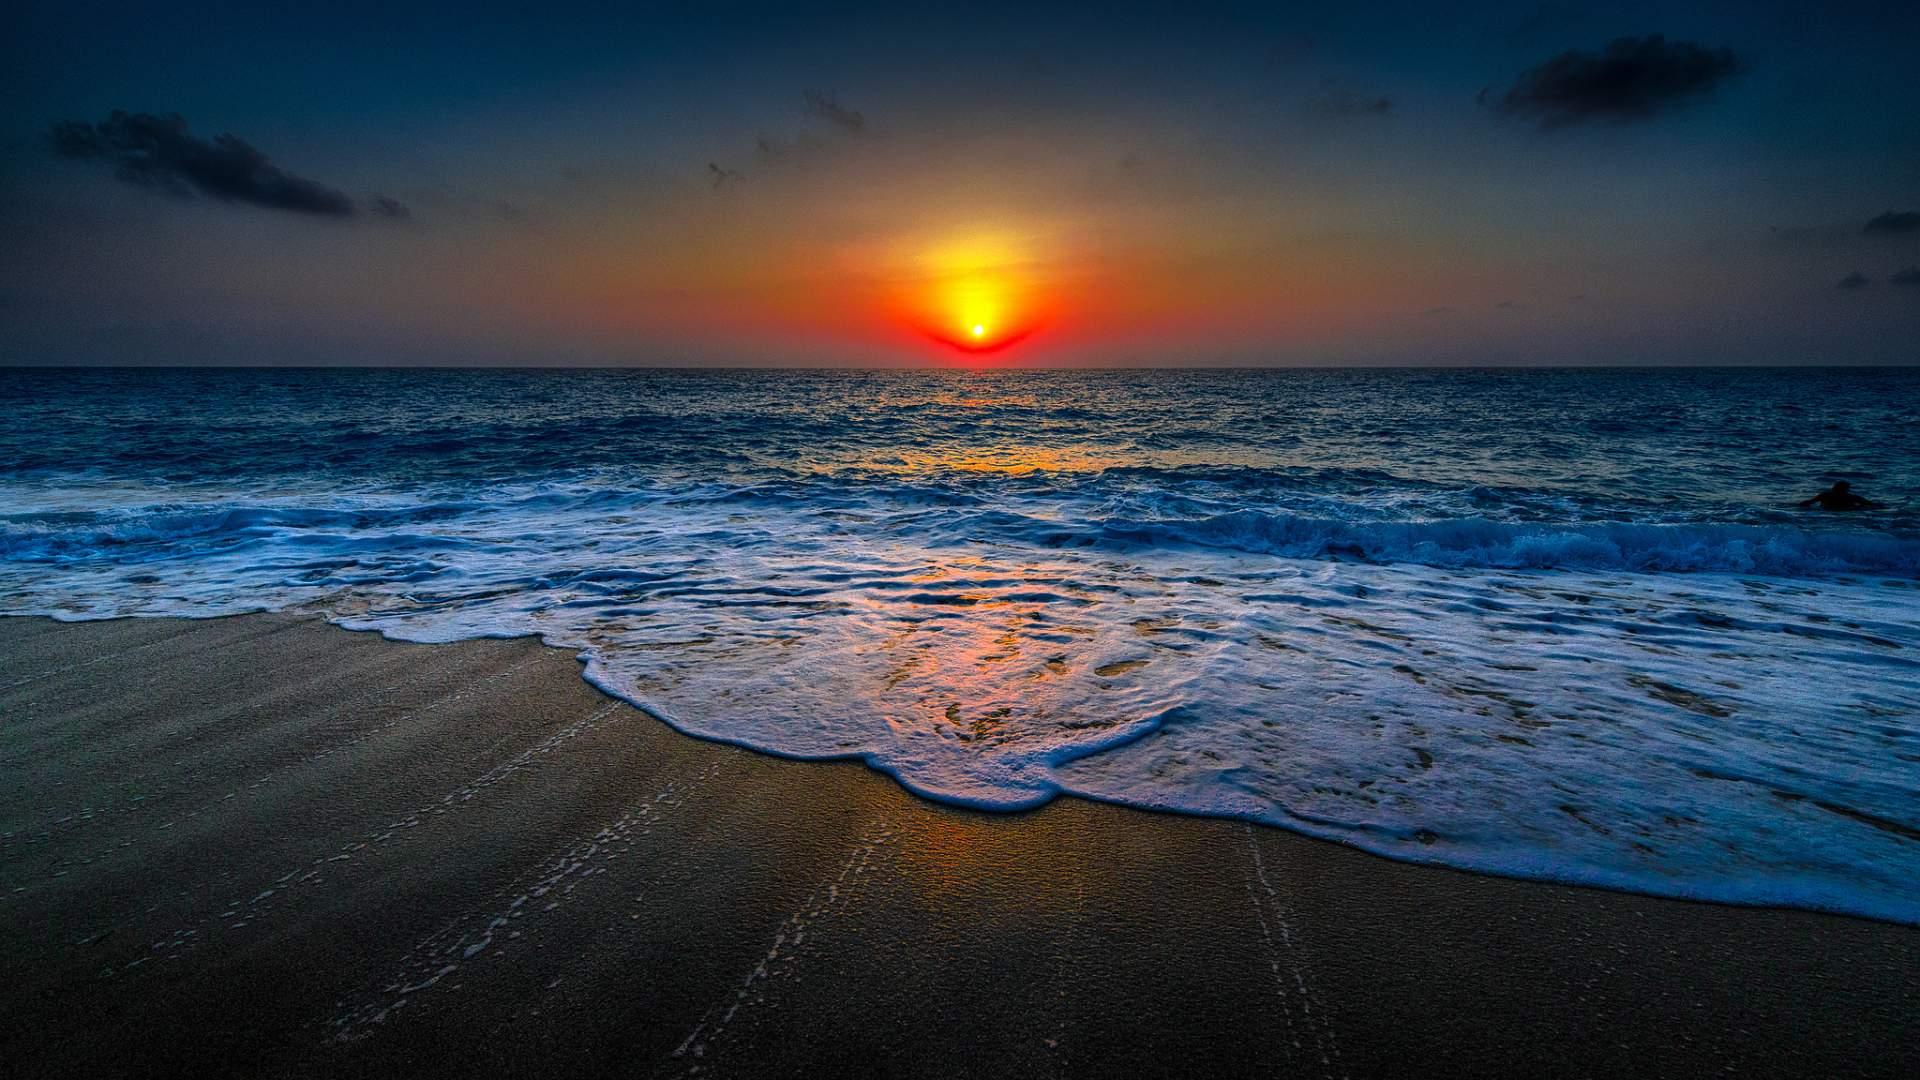 Sunset On The Beach Wallpaper HD Download For Desktop